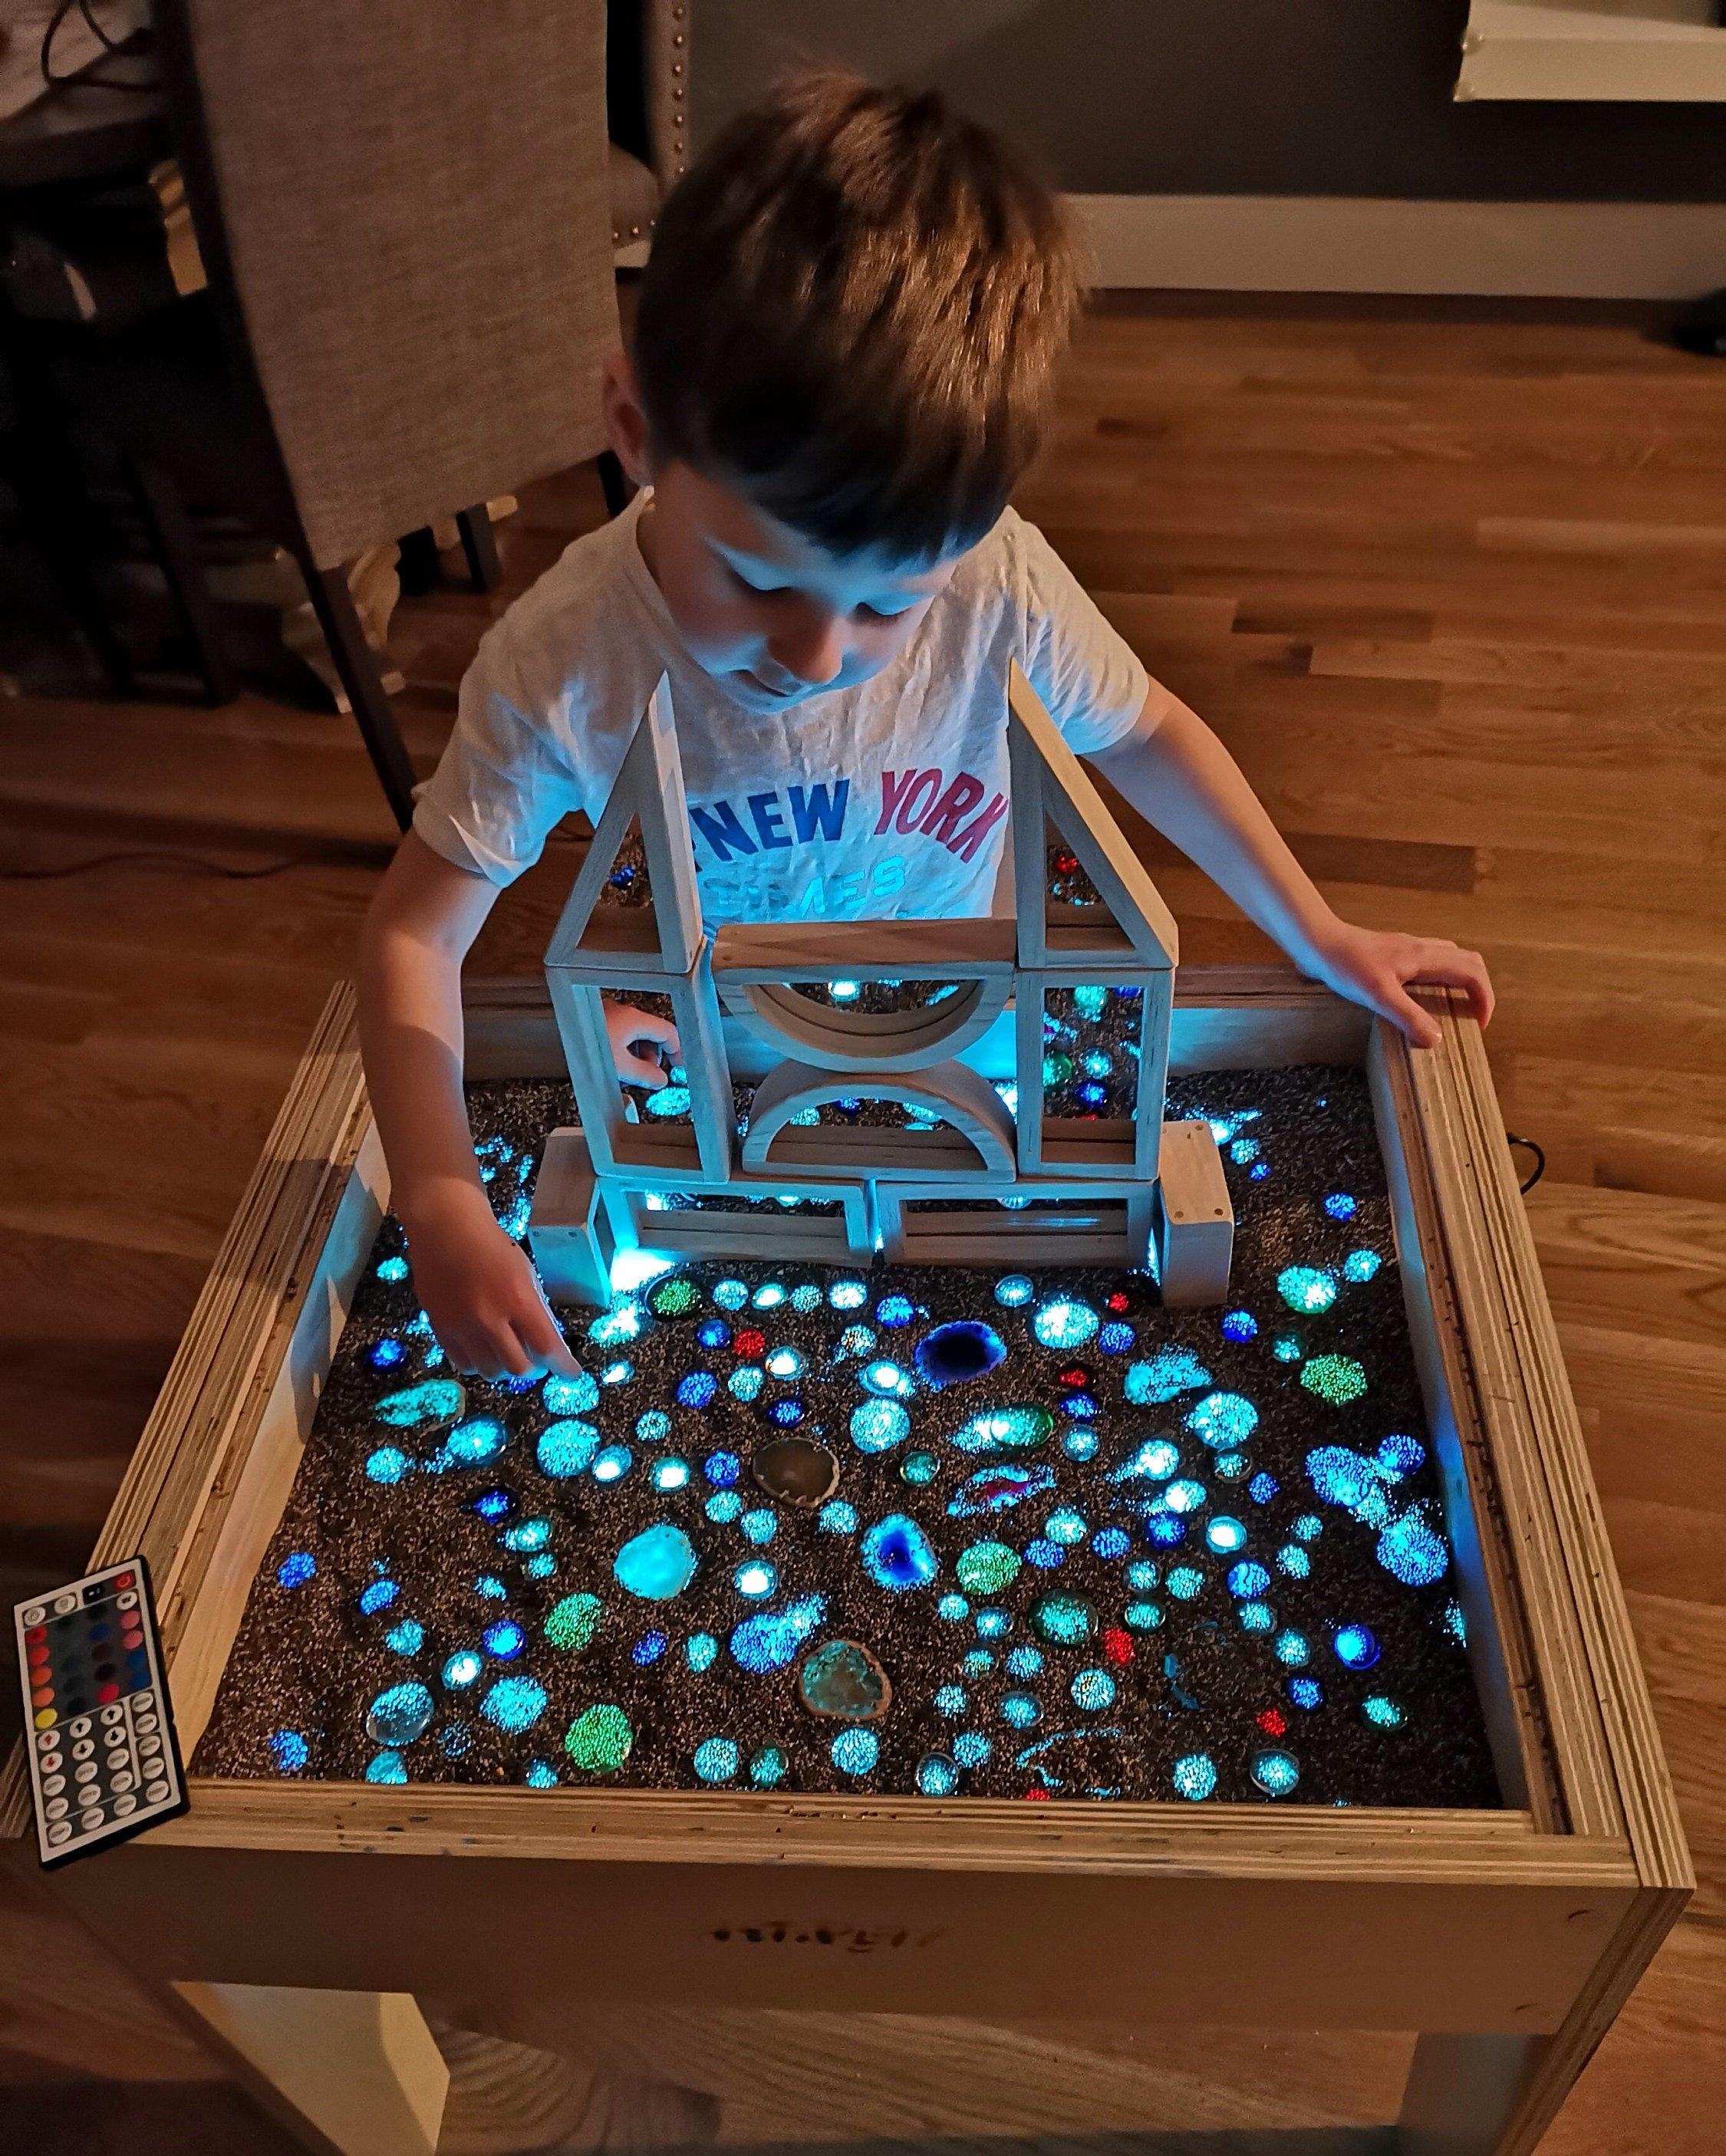 Art light activity wood table desk for kids montessori